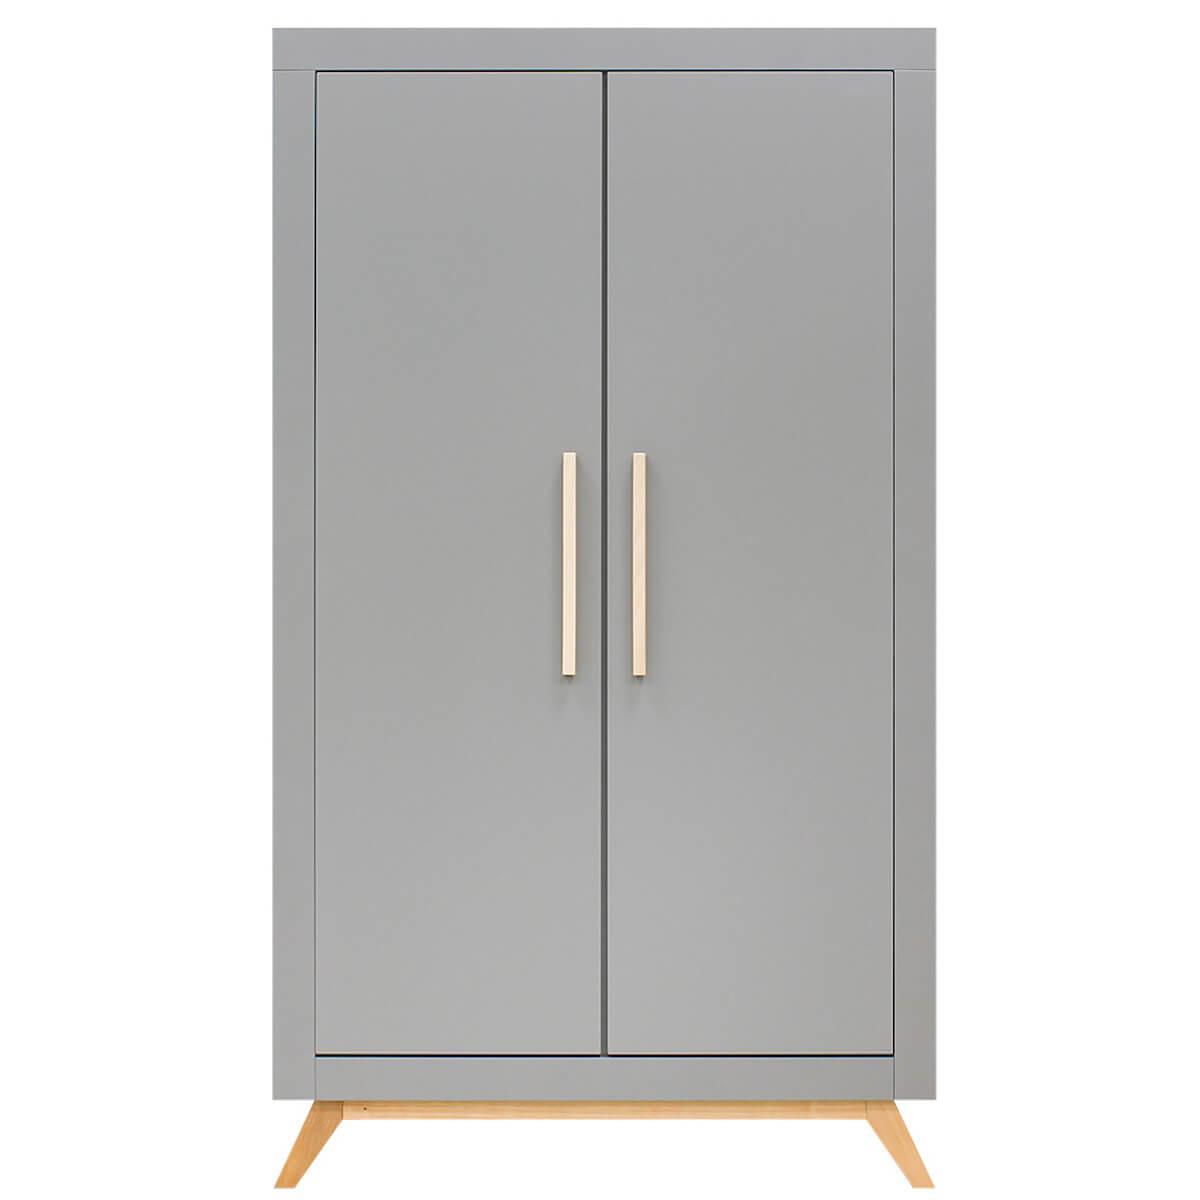 Armario 2 puertas FENNA Bopita gris-natural